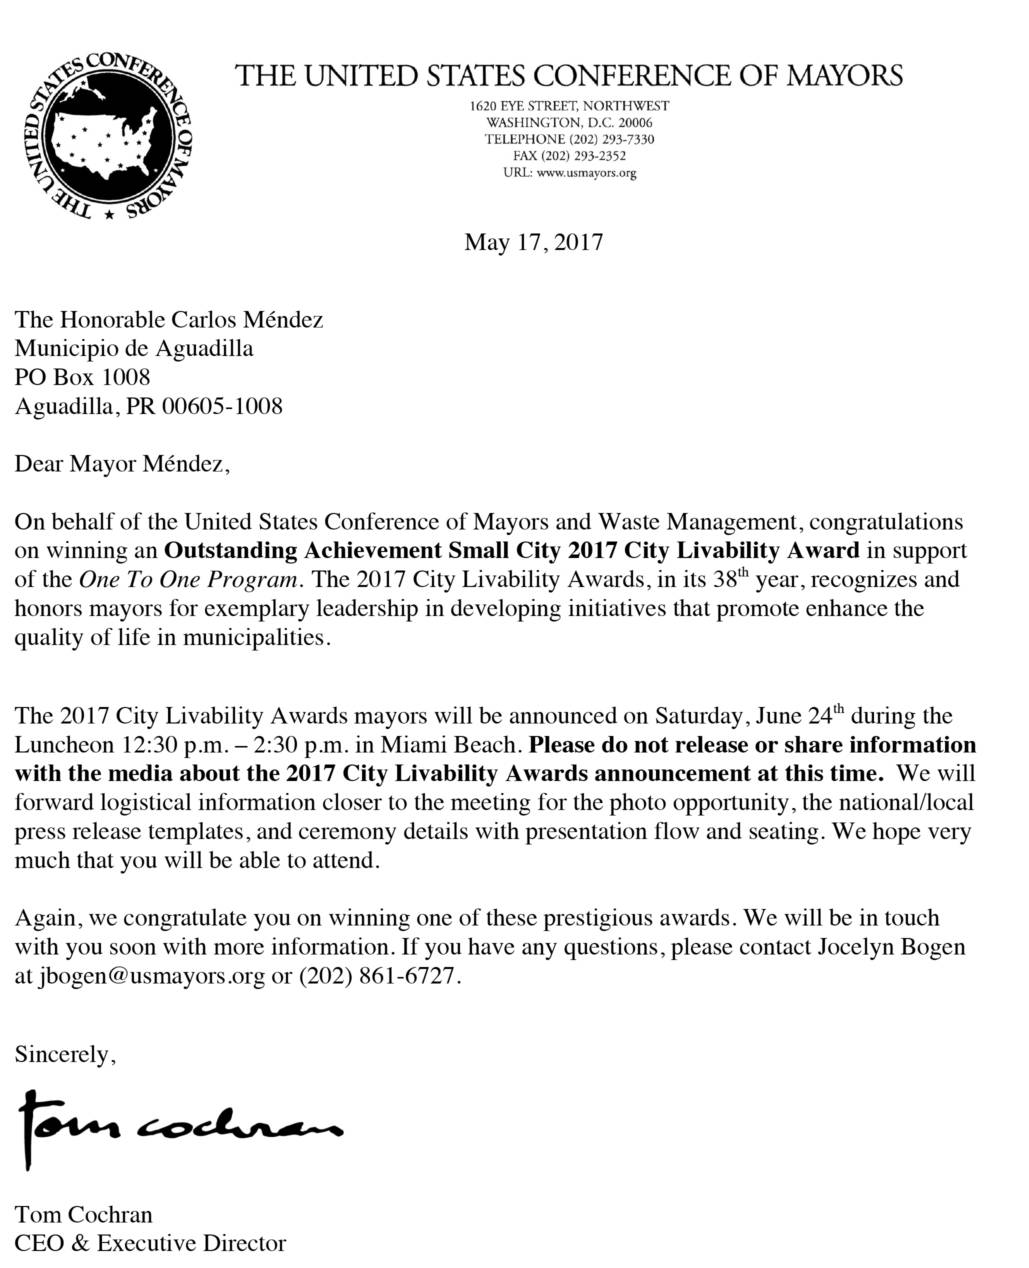 Microsoft Word - Aguadilla 2017 CLA Notification letter.docx